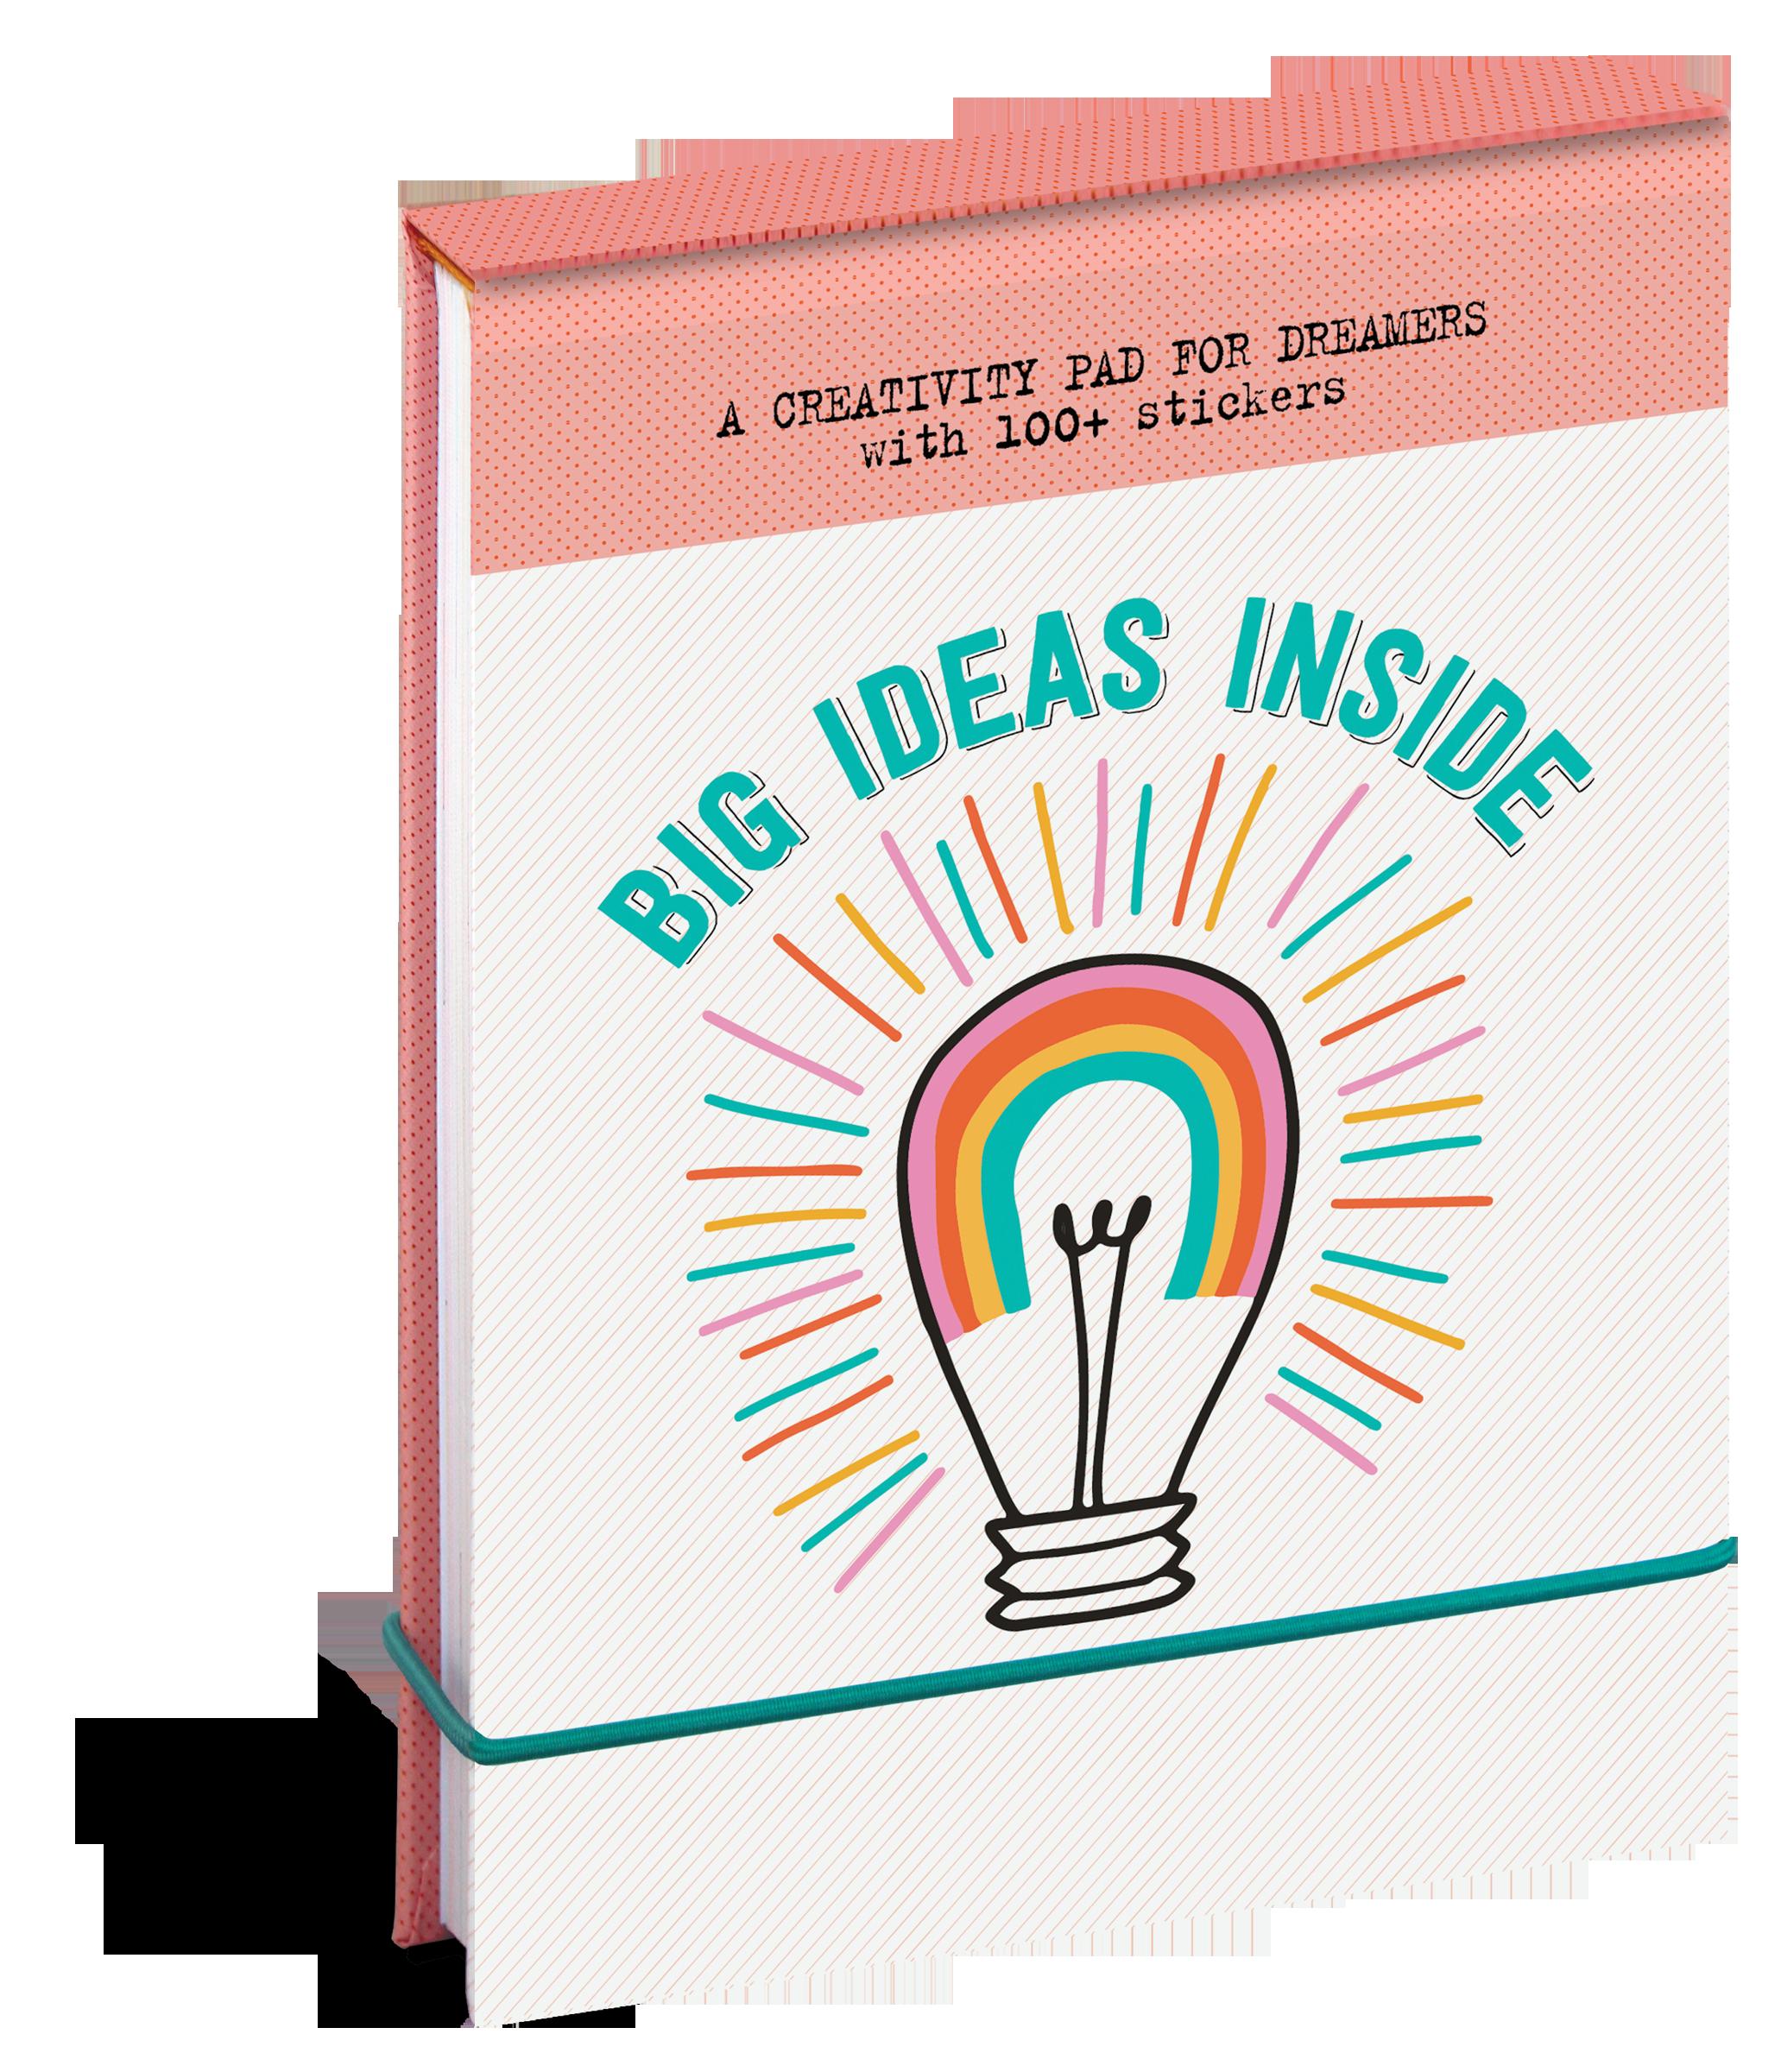 Big Ideas Inside.png